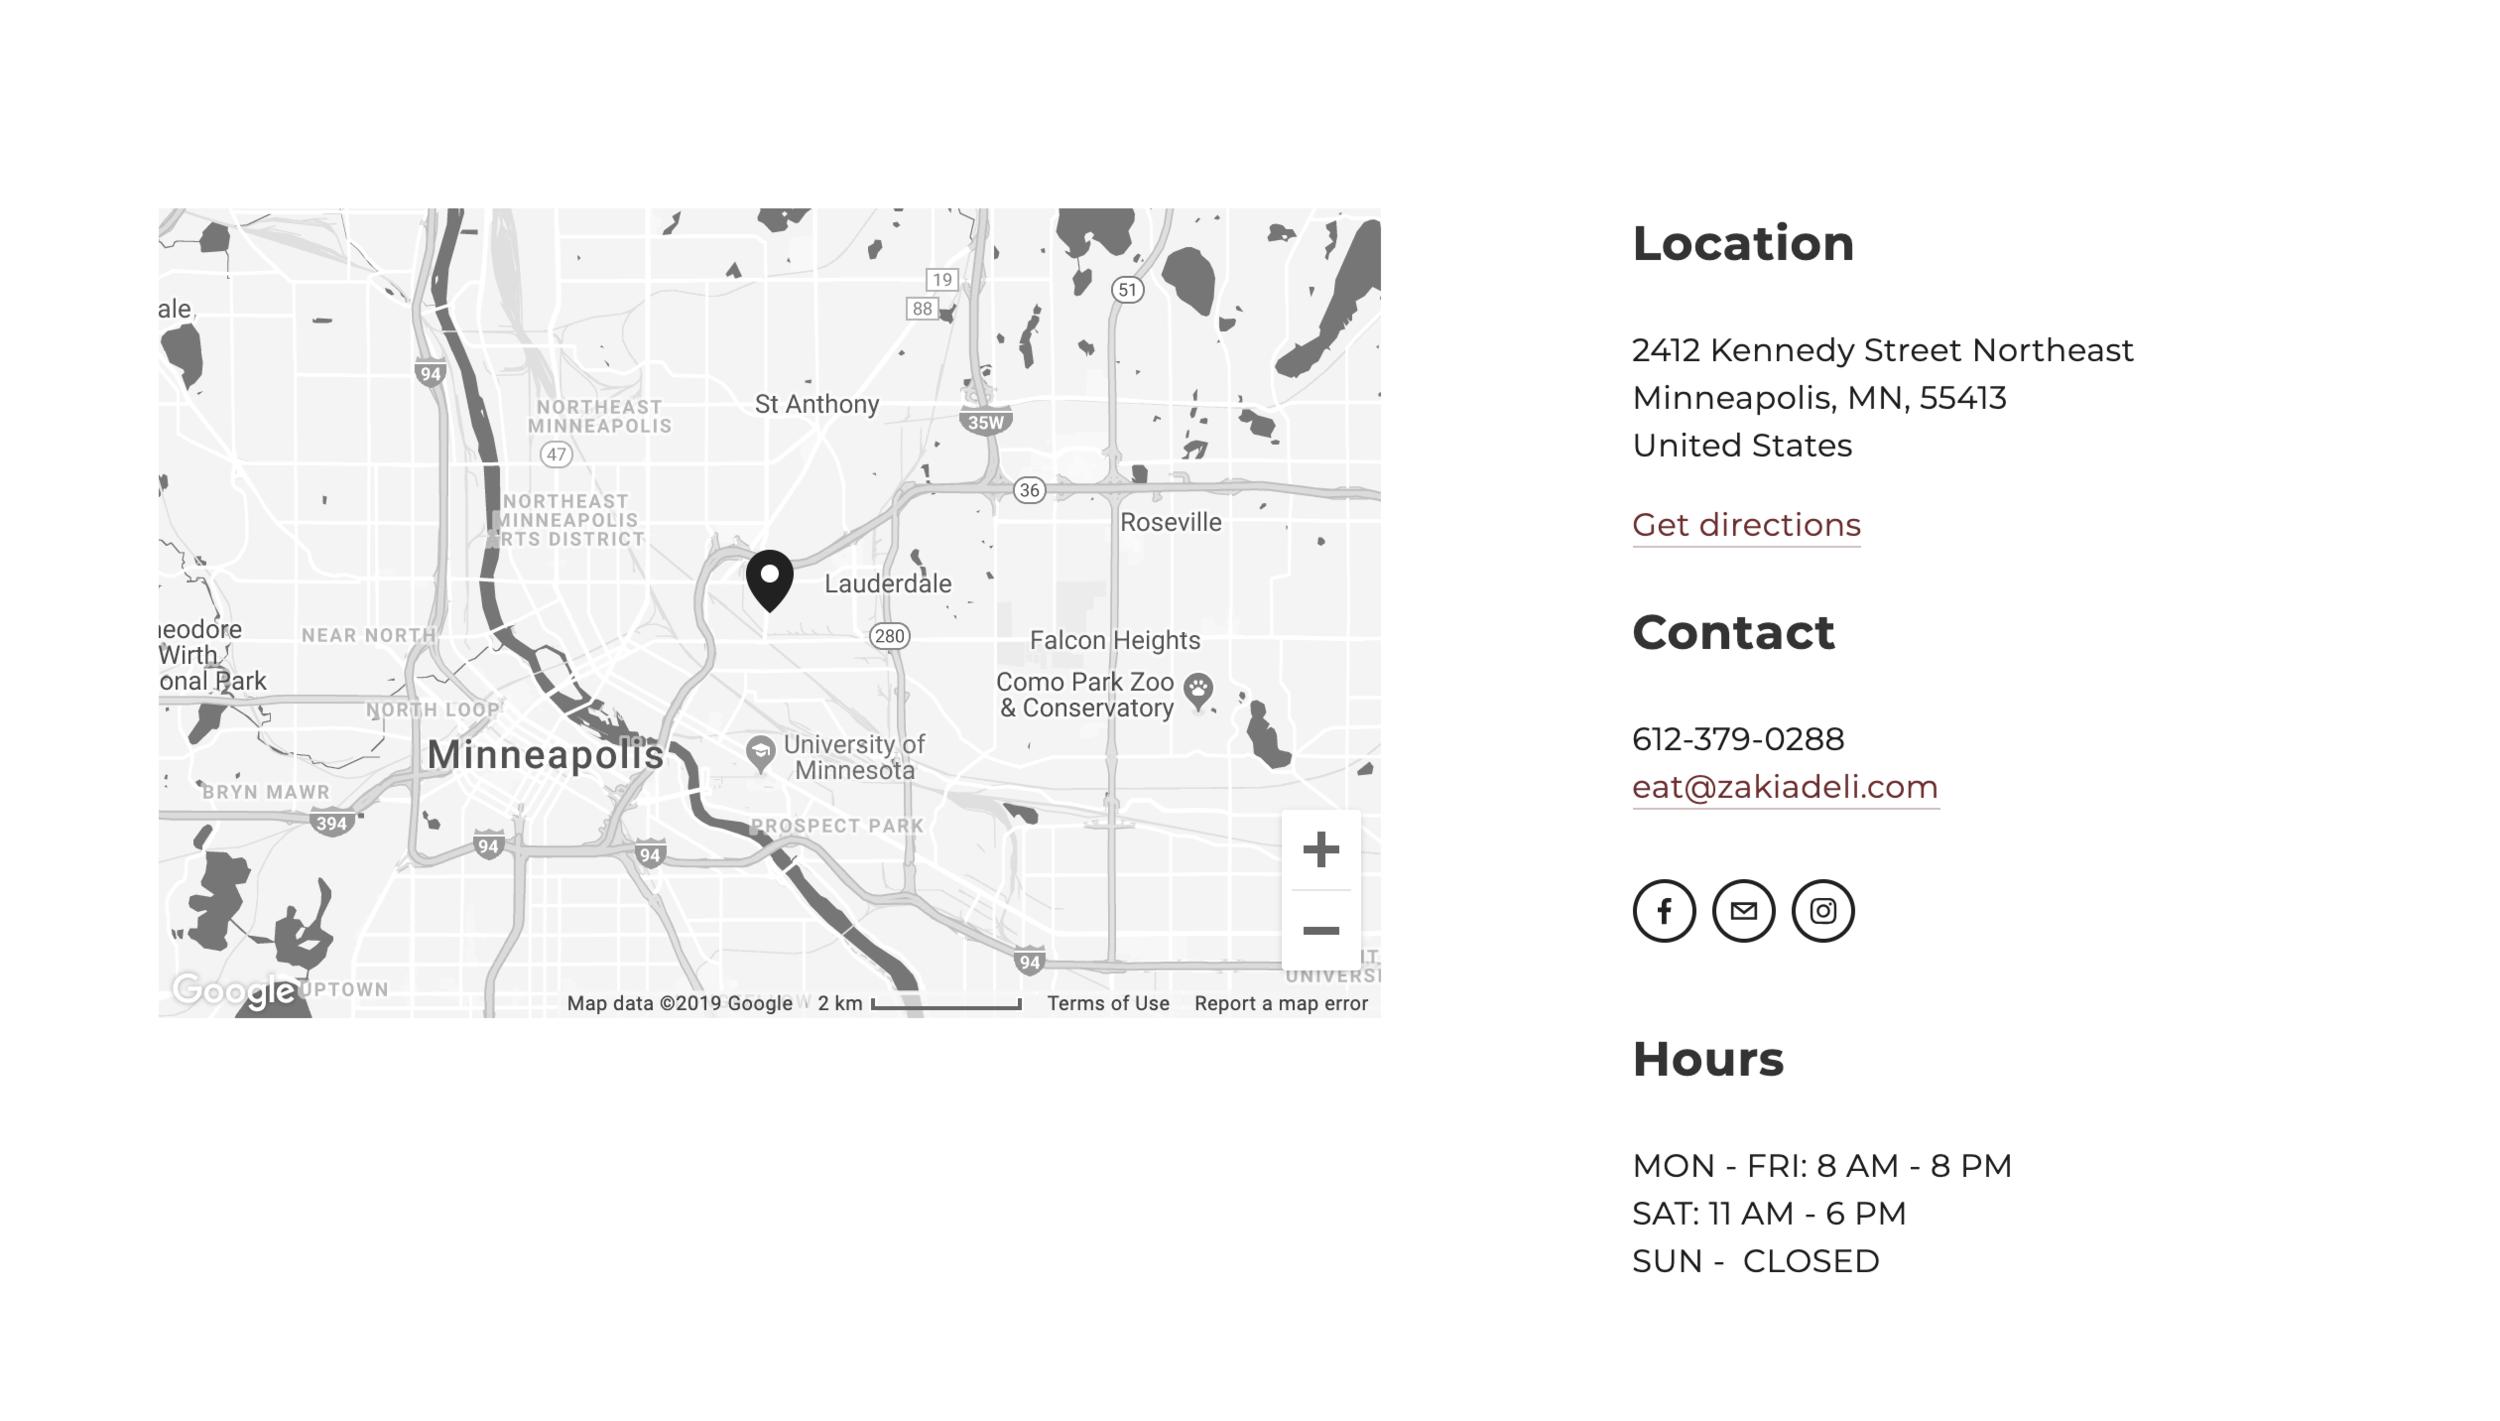 Zakia Deli Map and Location Section